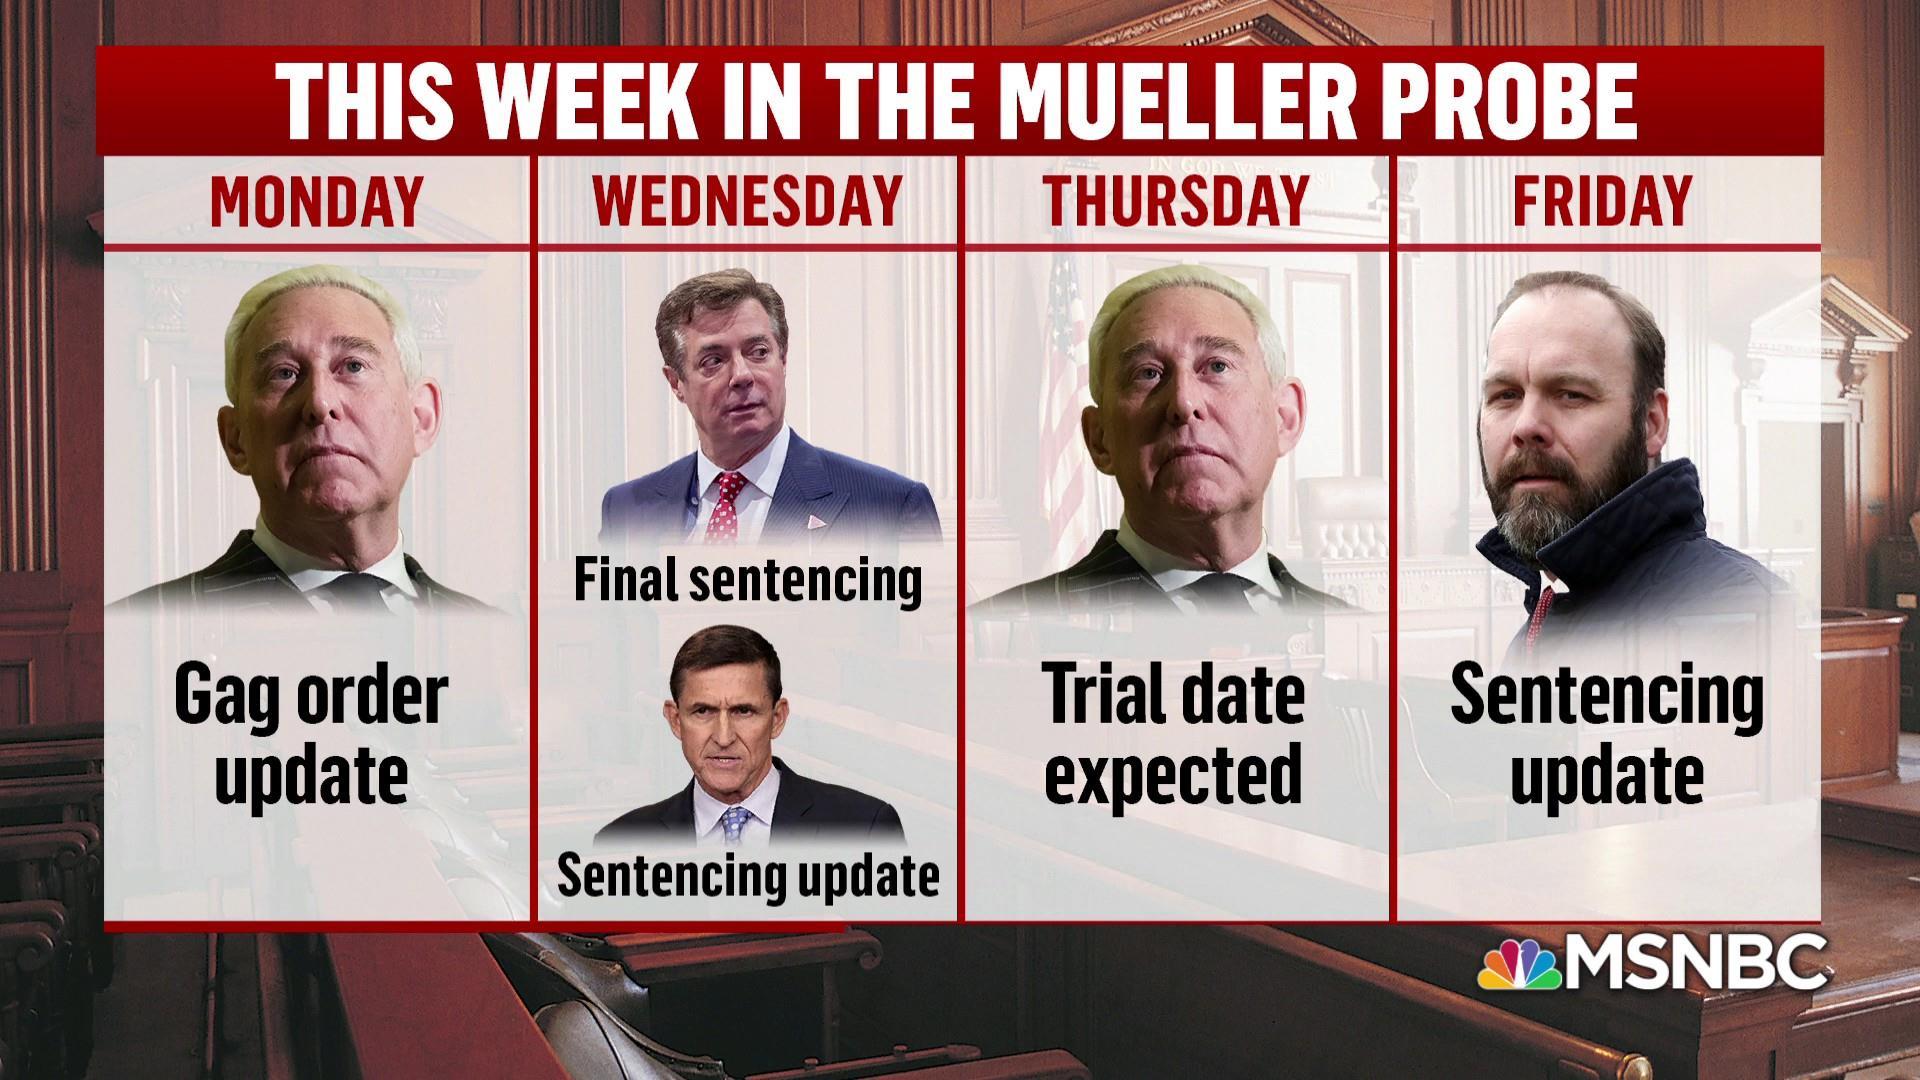 Big week of answers ahead in the Mueller probe